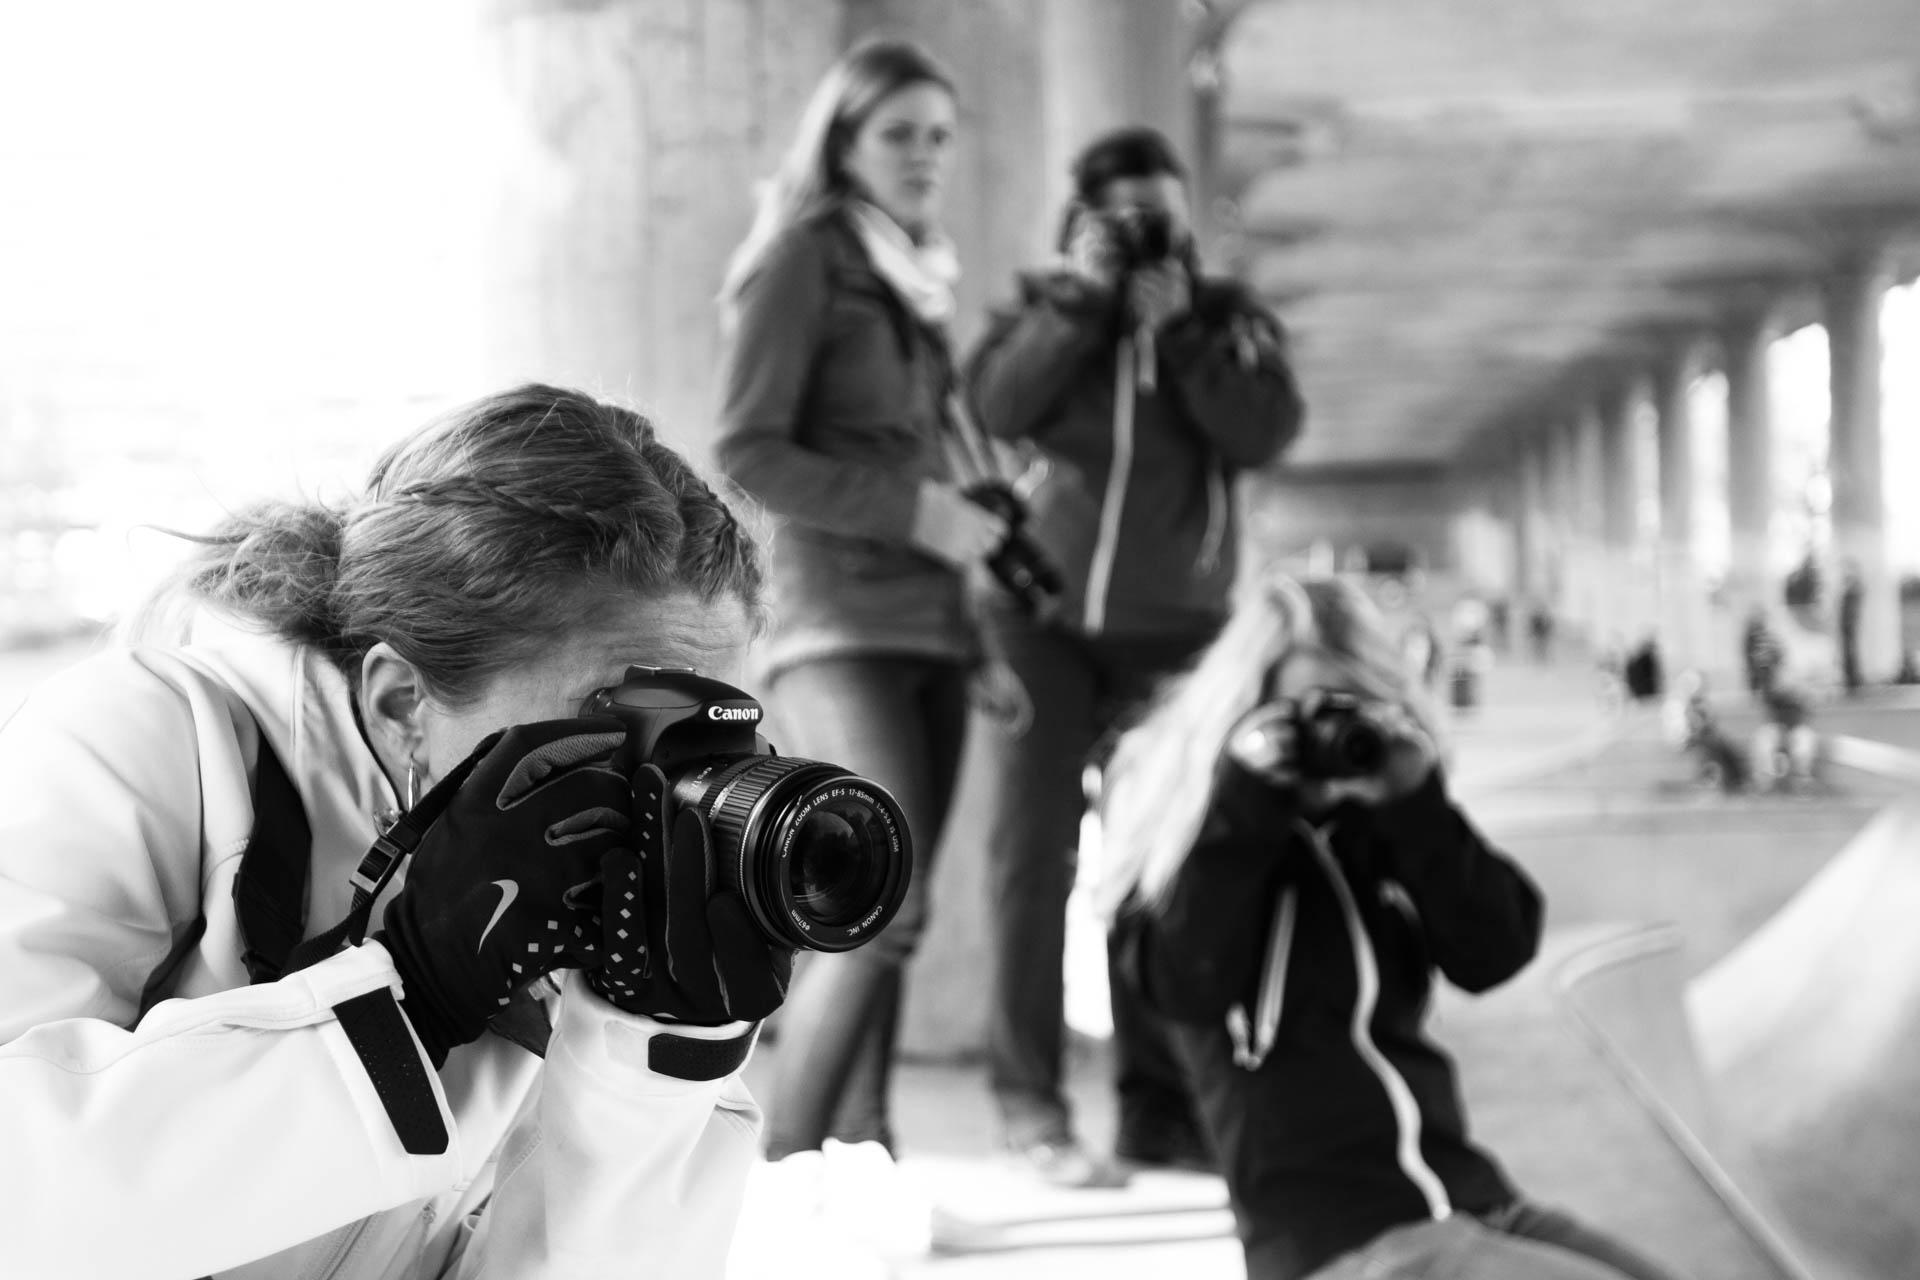 Fotokurser online grundkurs steg 1 med kursledare